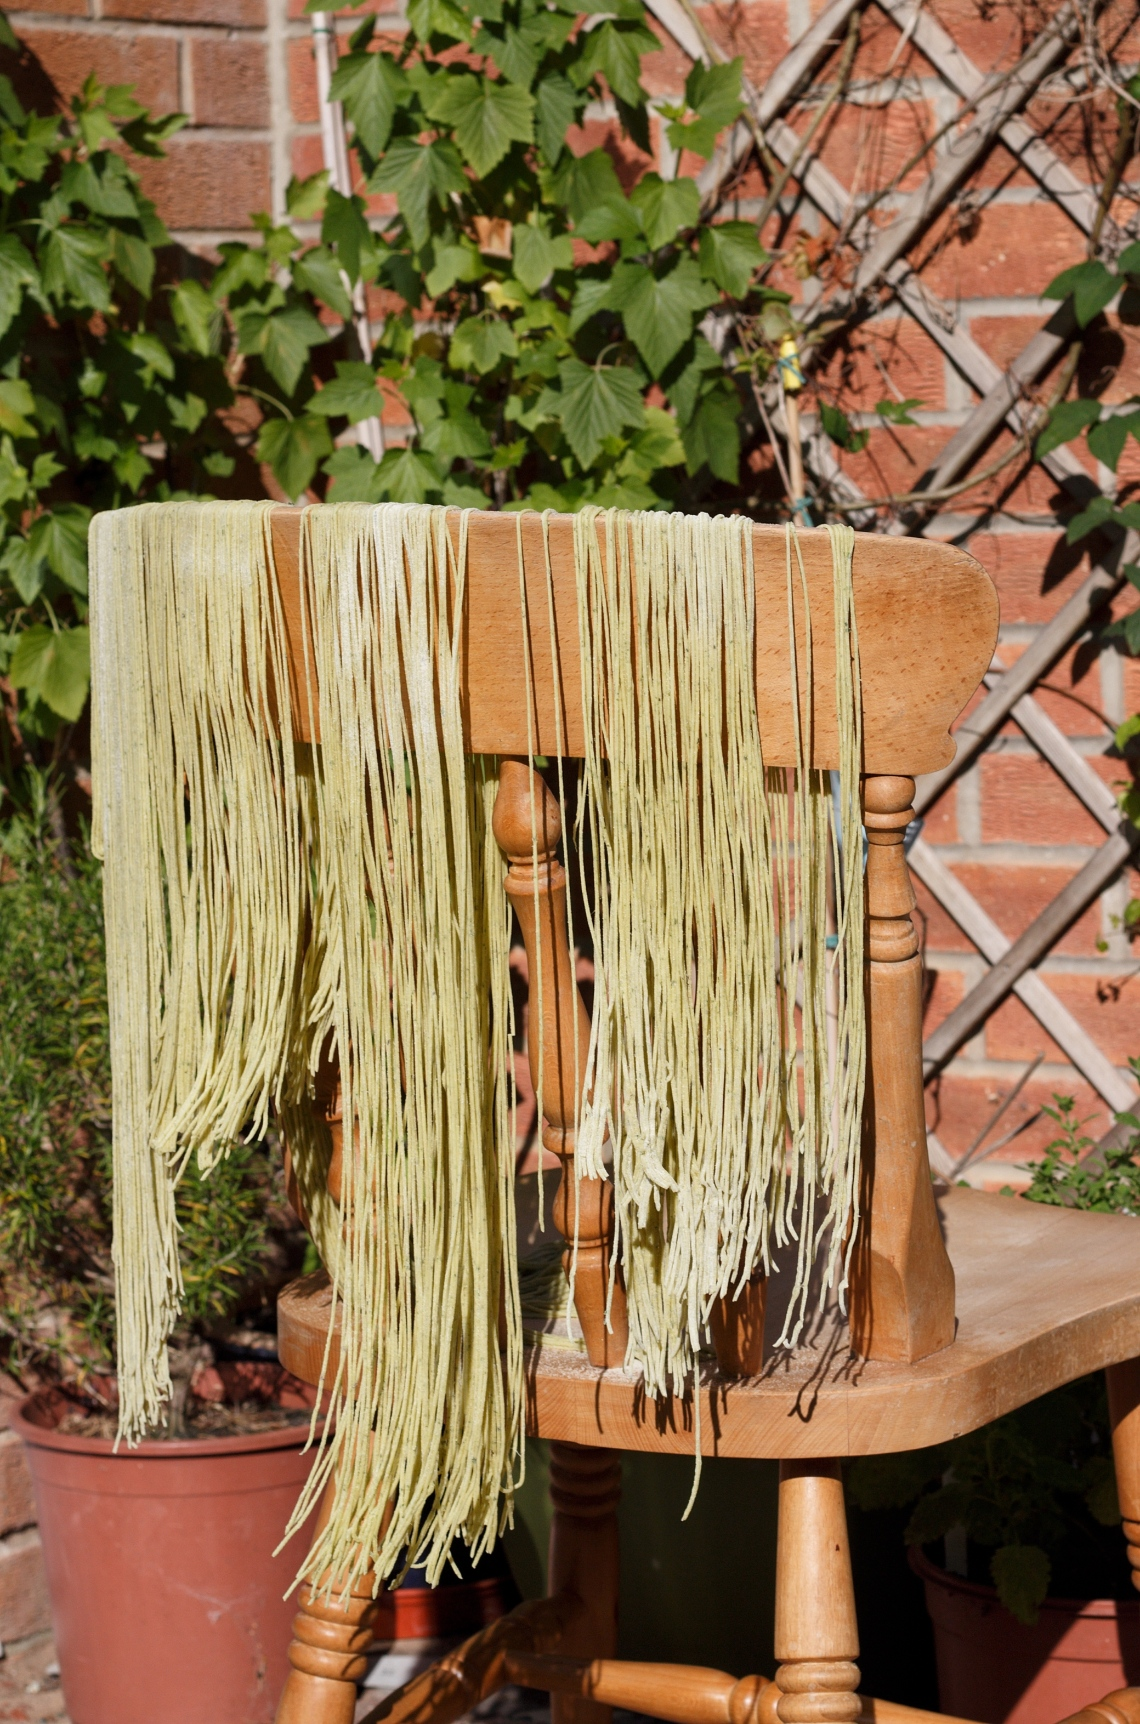 bloody dock pasta - copyright image Lynn Clark - inksugarspice